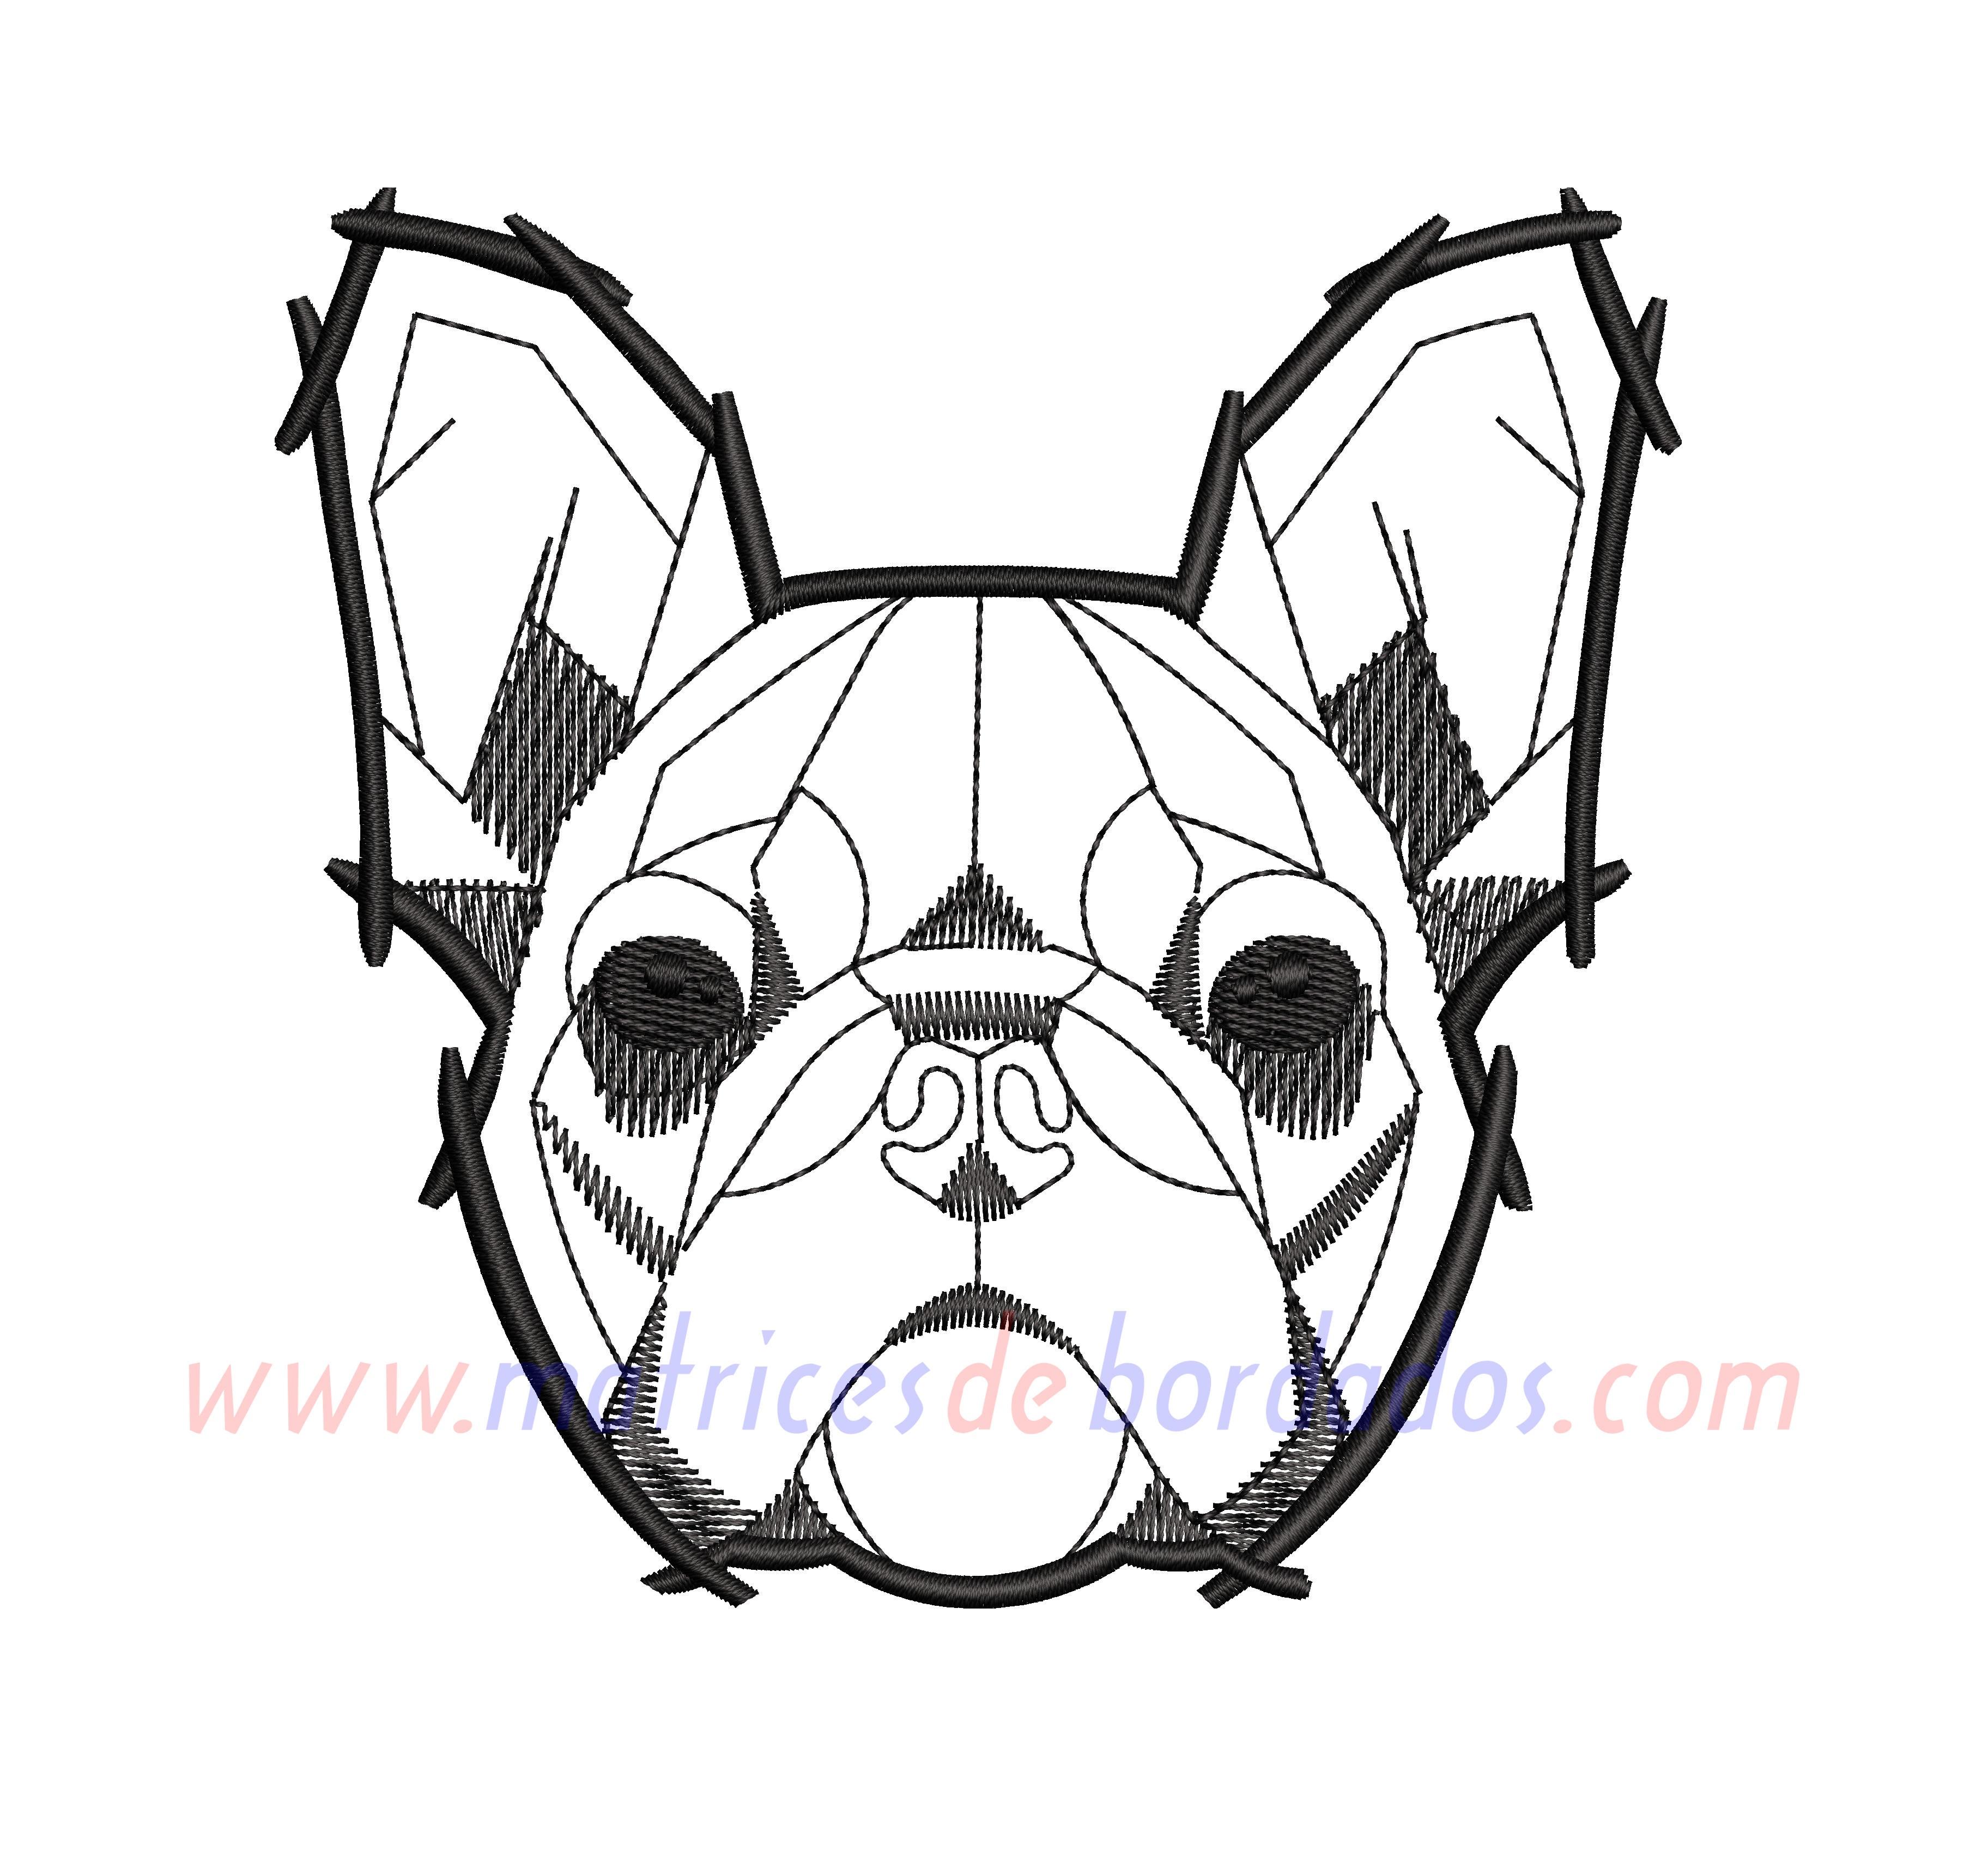 QQ53VB - French Bulldog